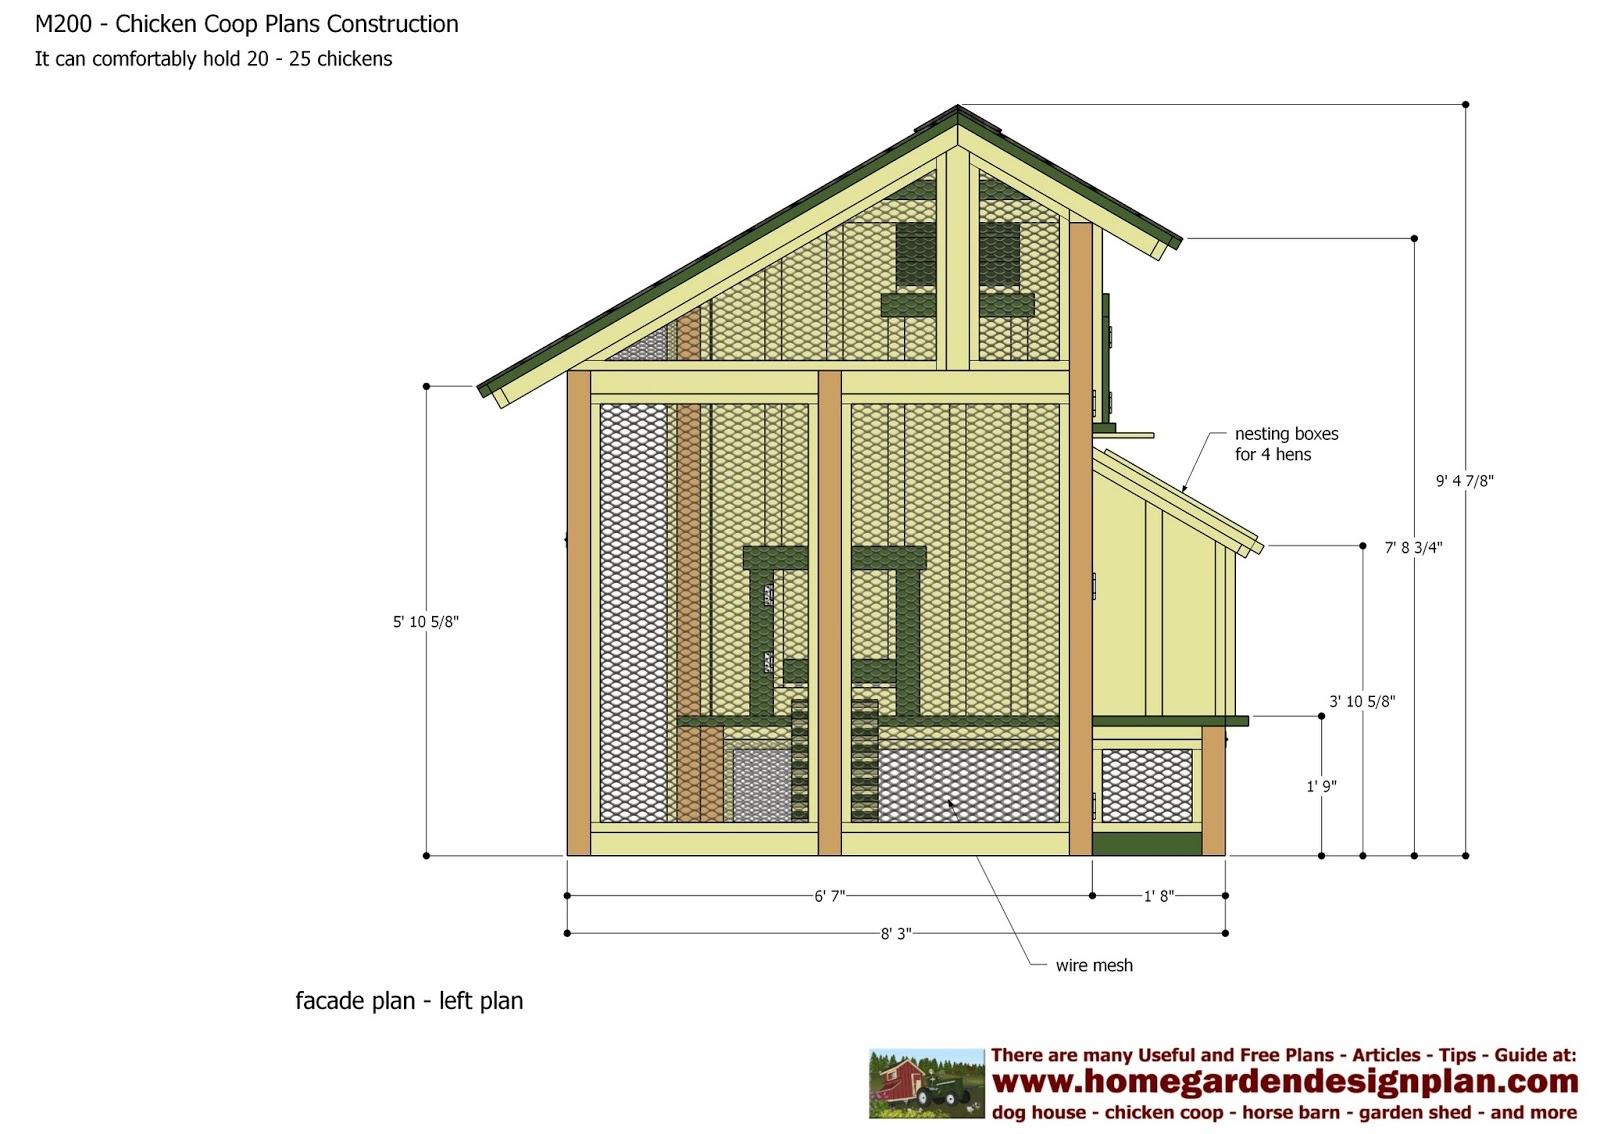 Gellencoop: Free Printable Plans For A Chicken Coop - Free Printable Chicken Coop Plans